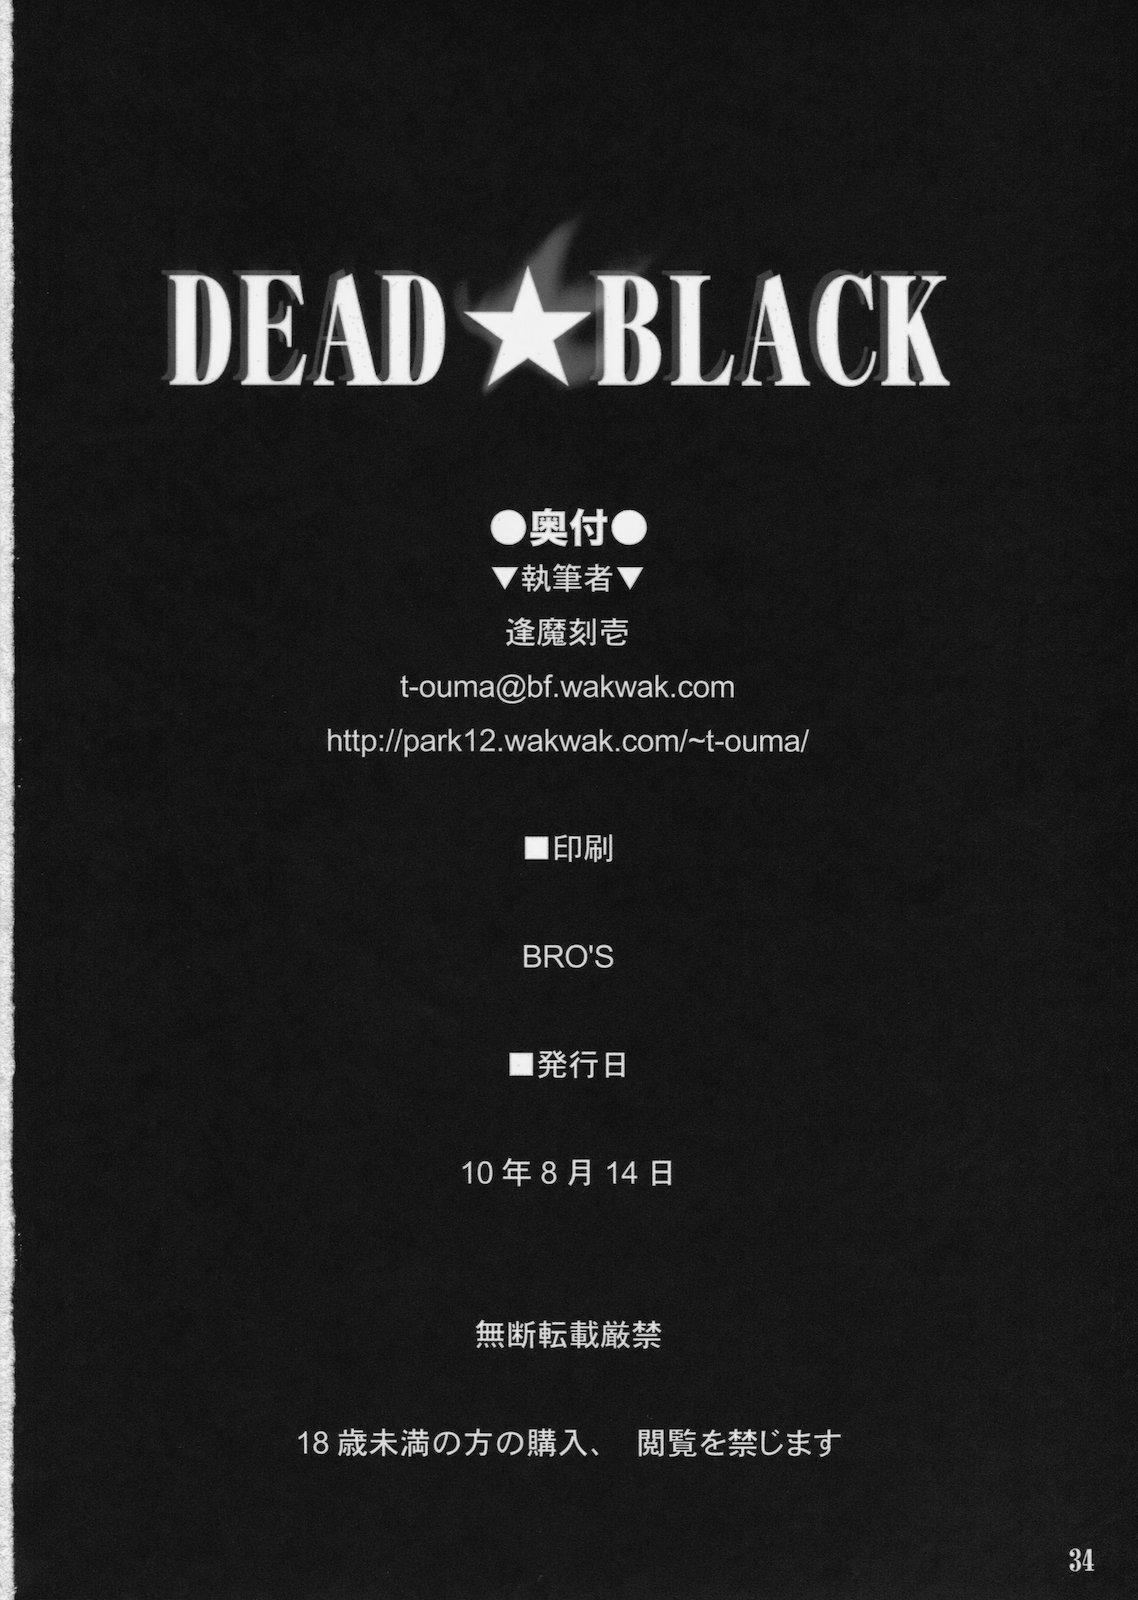 DEAD★BLACK 33